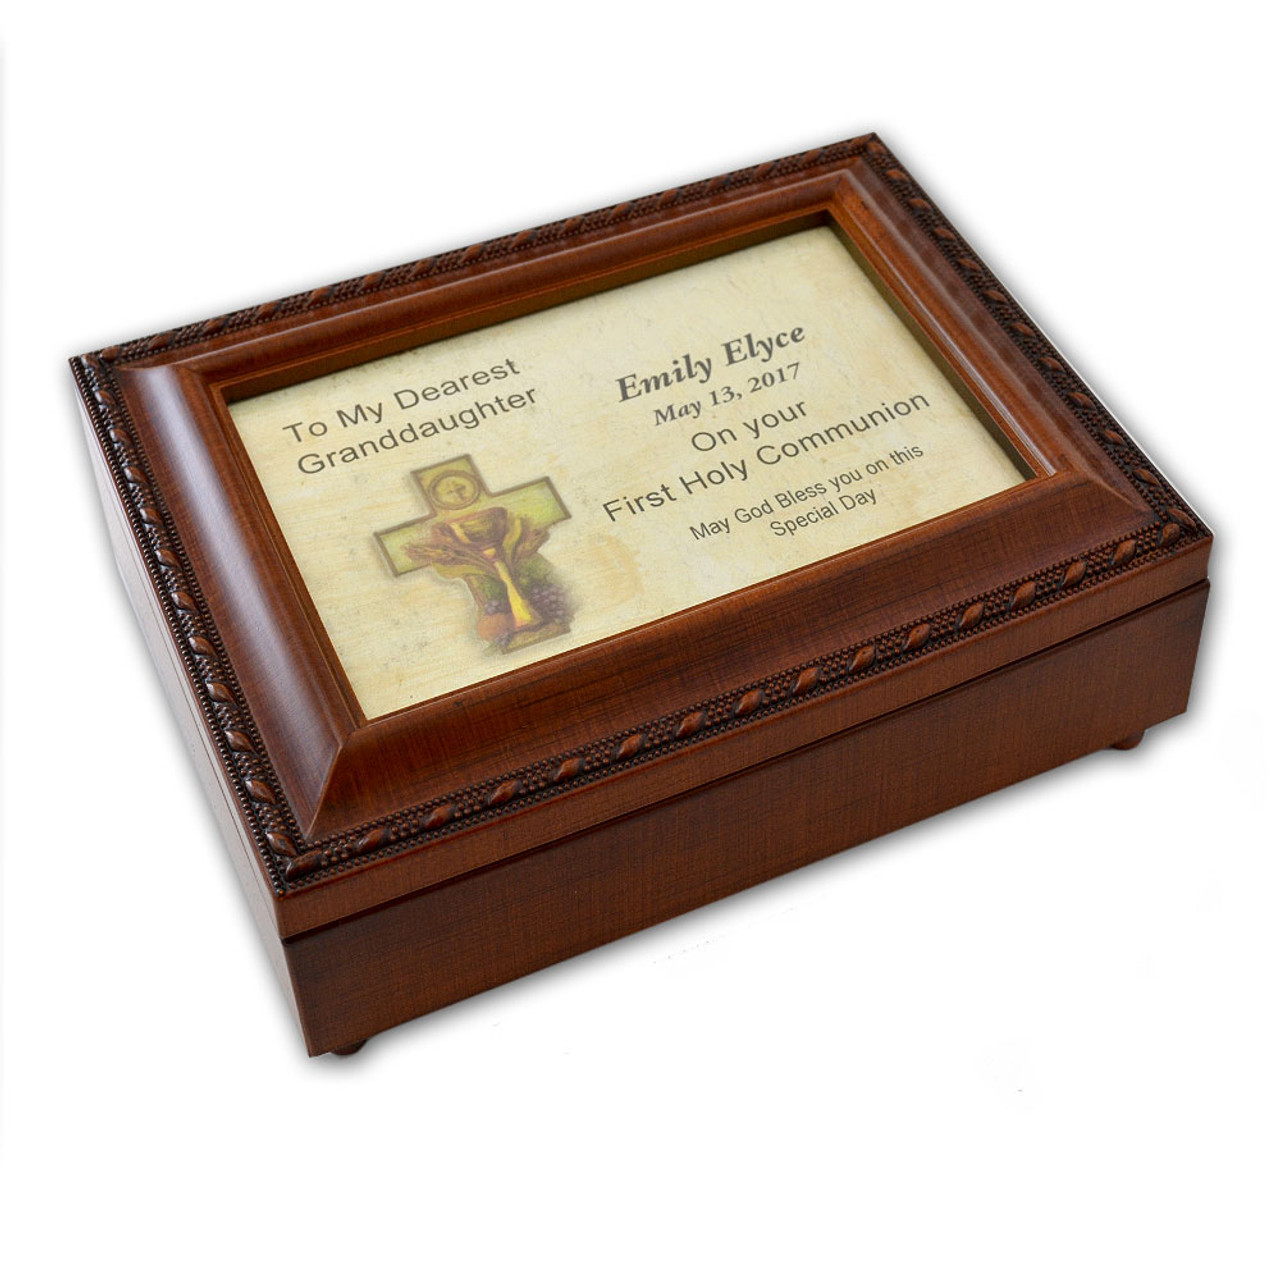 Granddaughter Communion Music Box Personalized